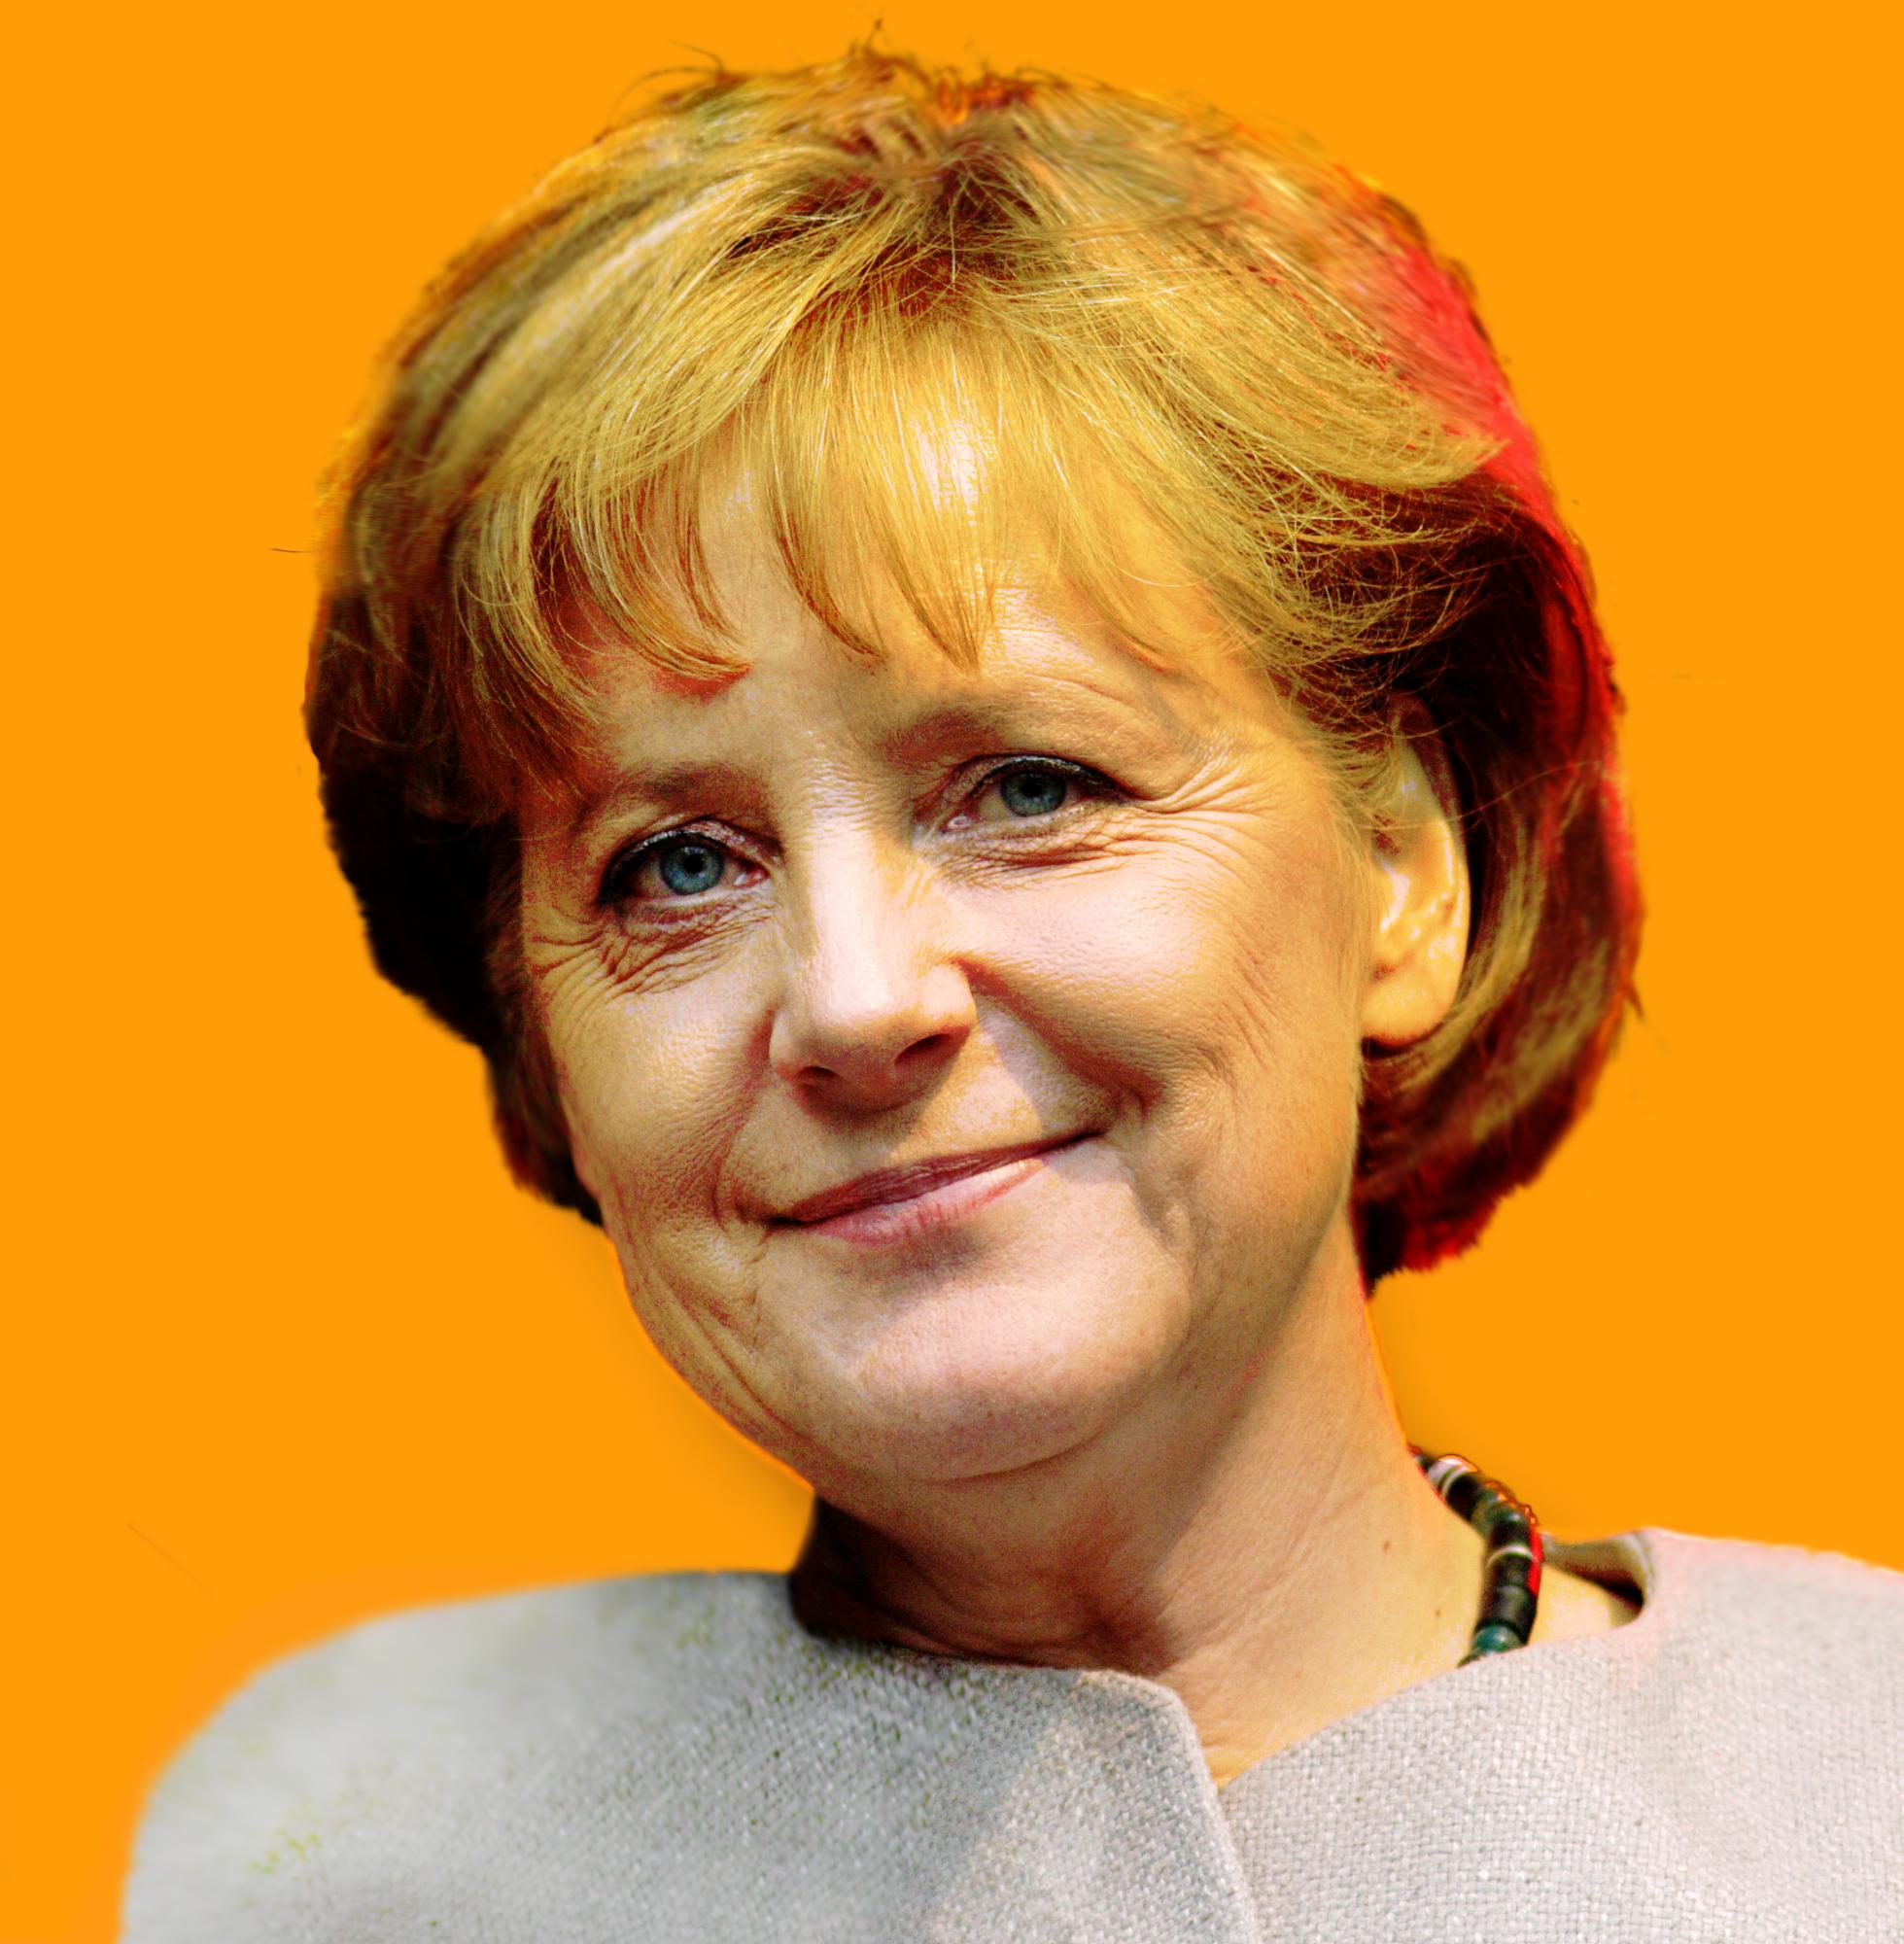 Angela Merkel's quote #7